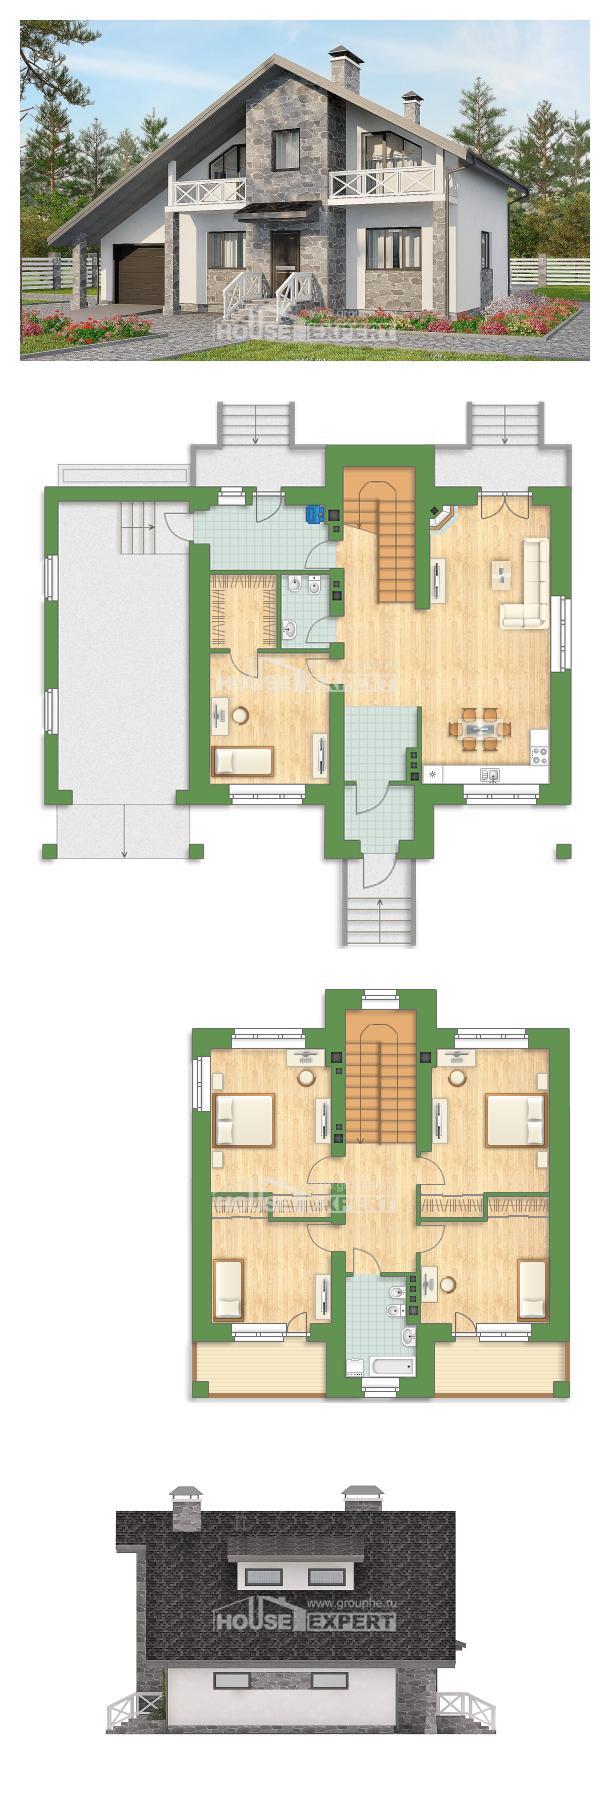 Проект дома 180-017-Л | House Expert